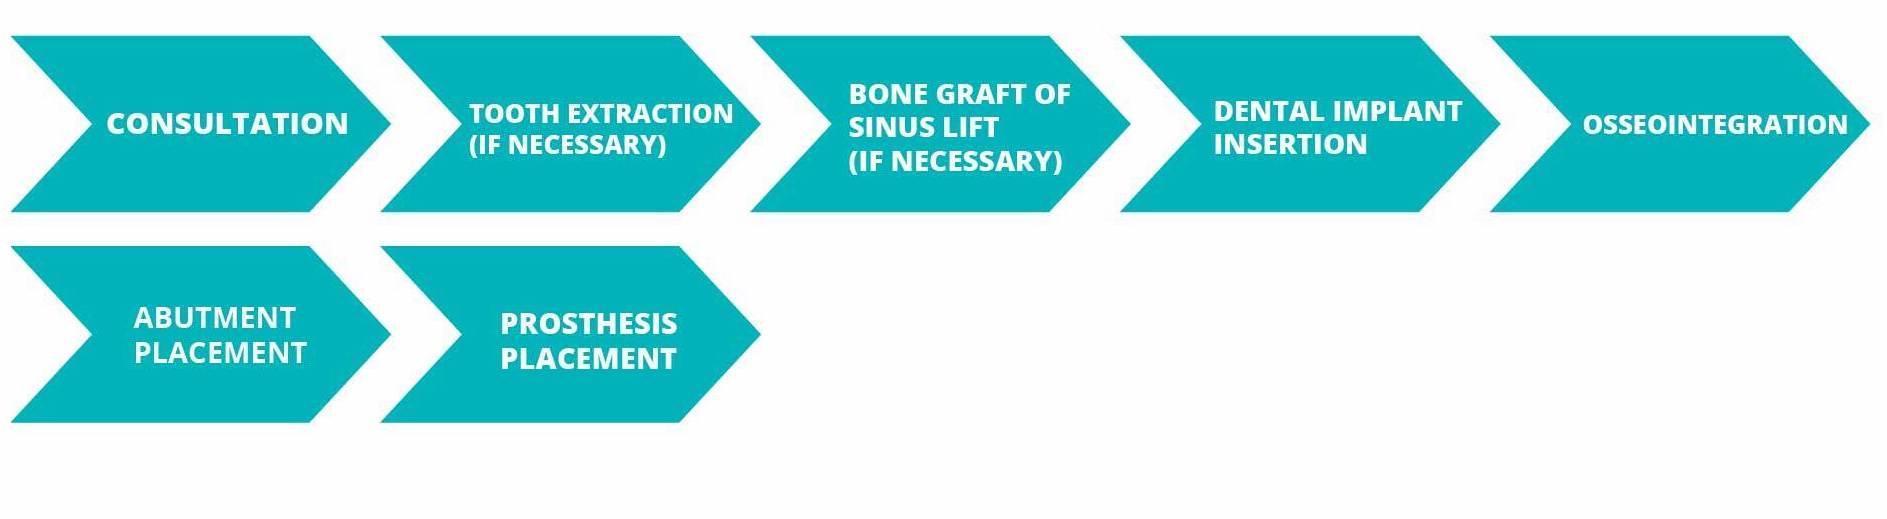 Dental Implants Graphic-03-1